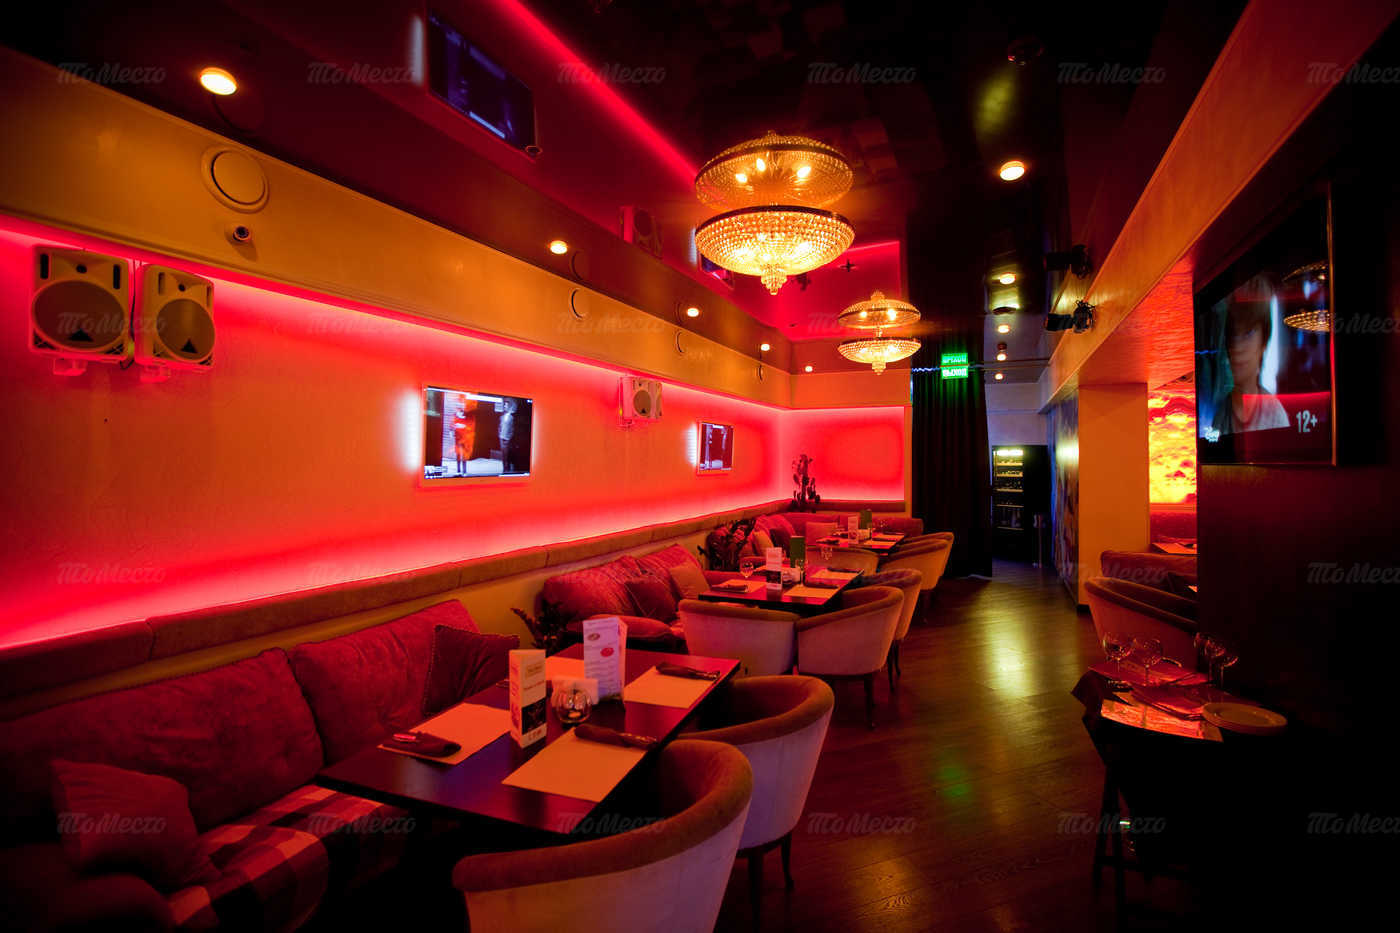 Меню караоке клуба, ресторана Образ на Марксистской улице